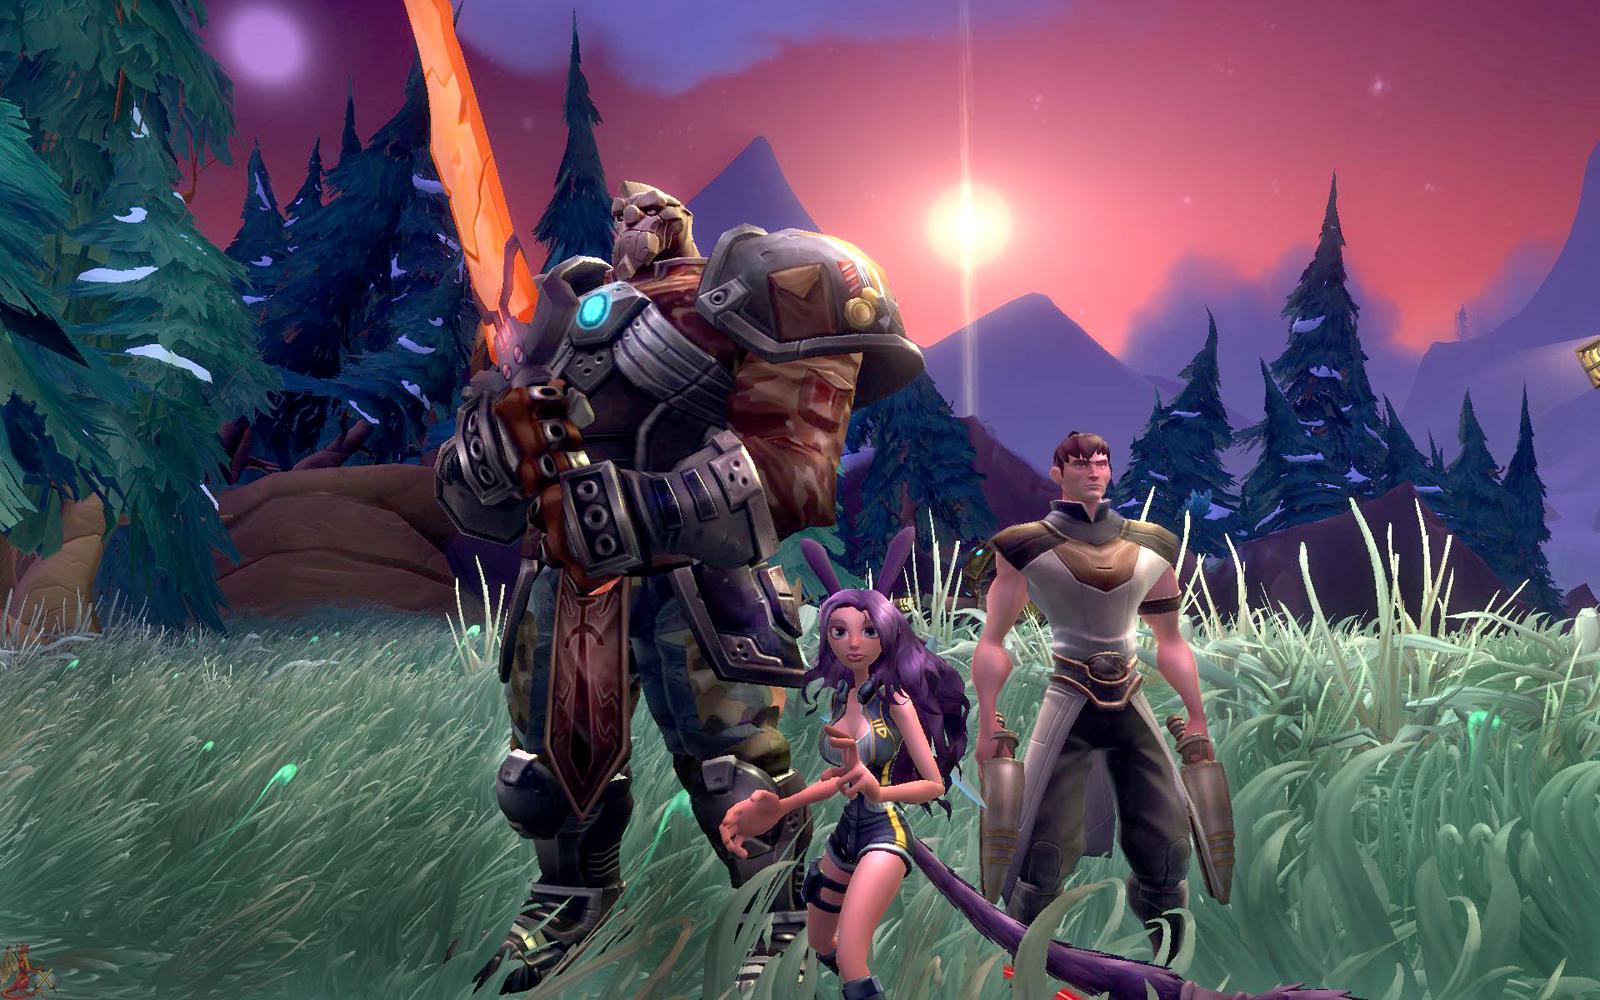 Wildstar, MMORPG, Sci-Fi, MMO, RPG, review, beta, opinion, issues, elitism, elitist, hardcore, casuals, pvp, raids, raiding, battlegrounds